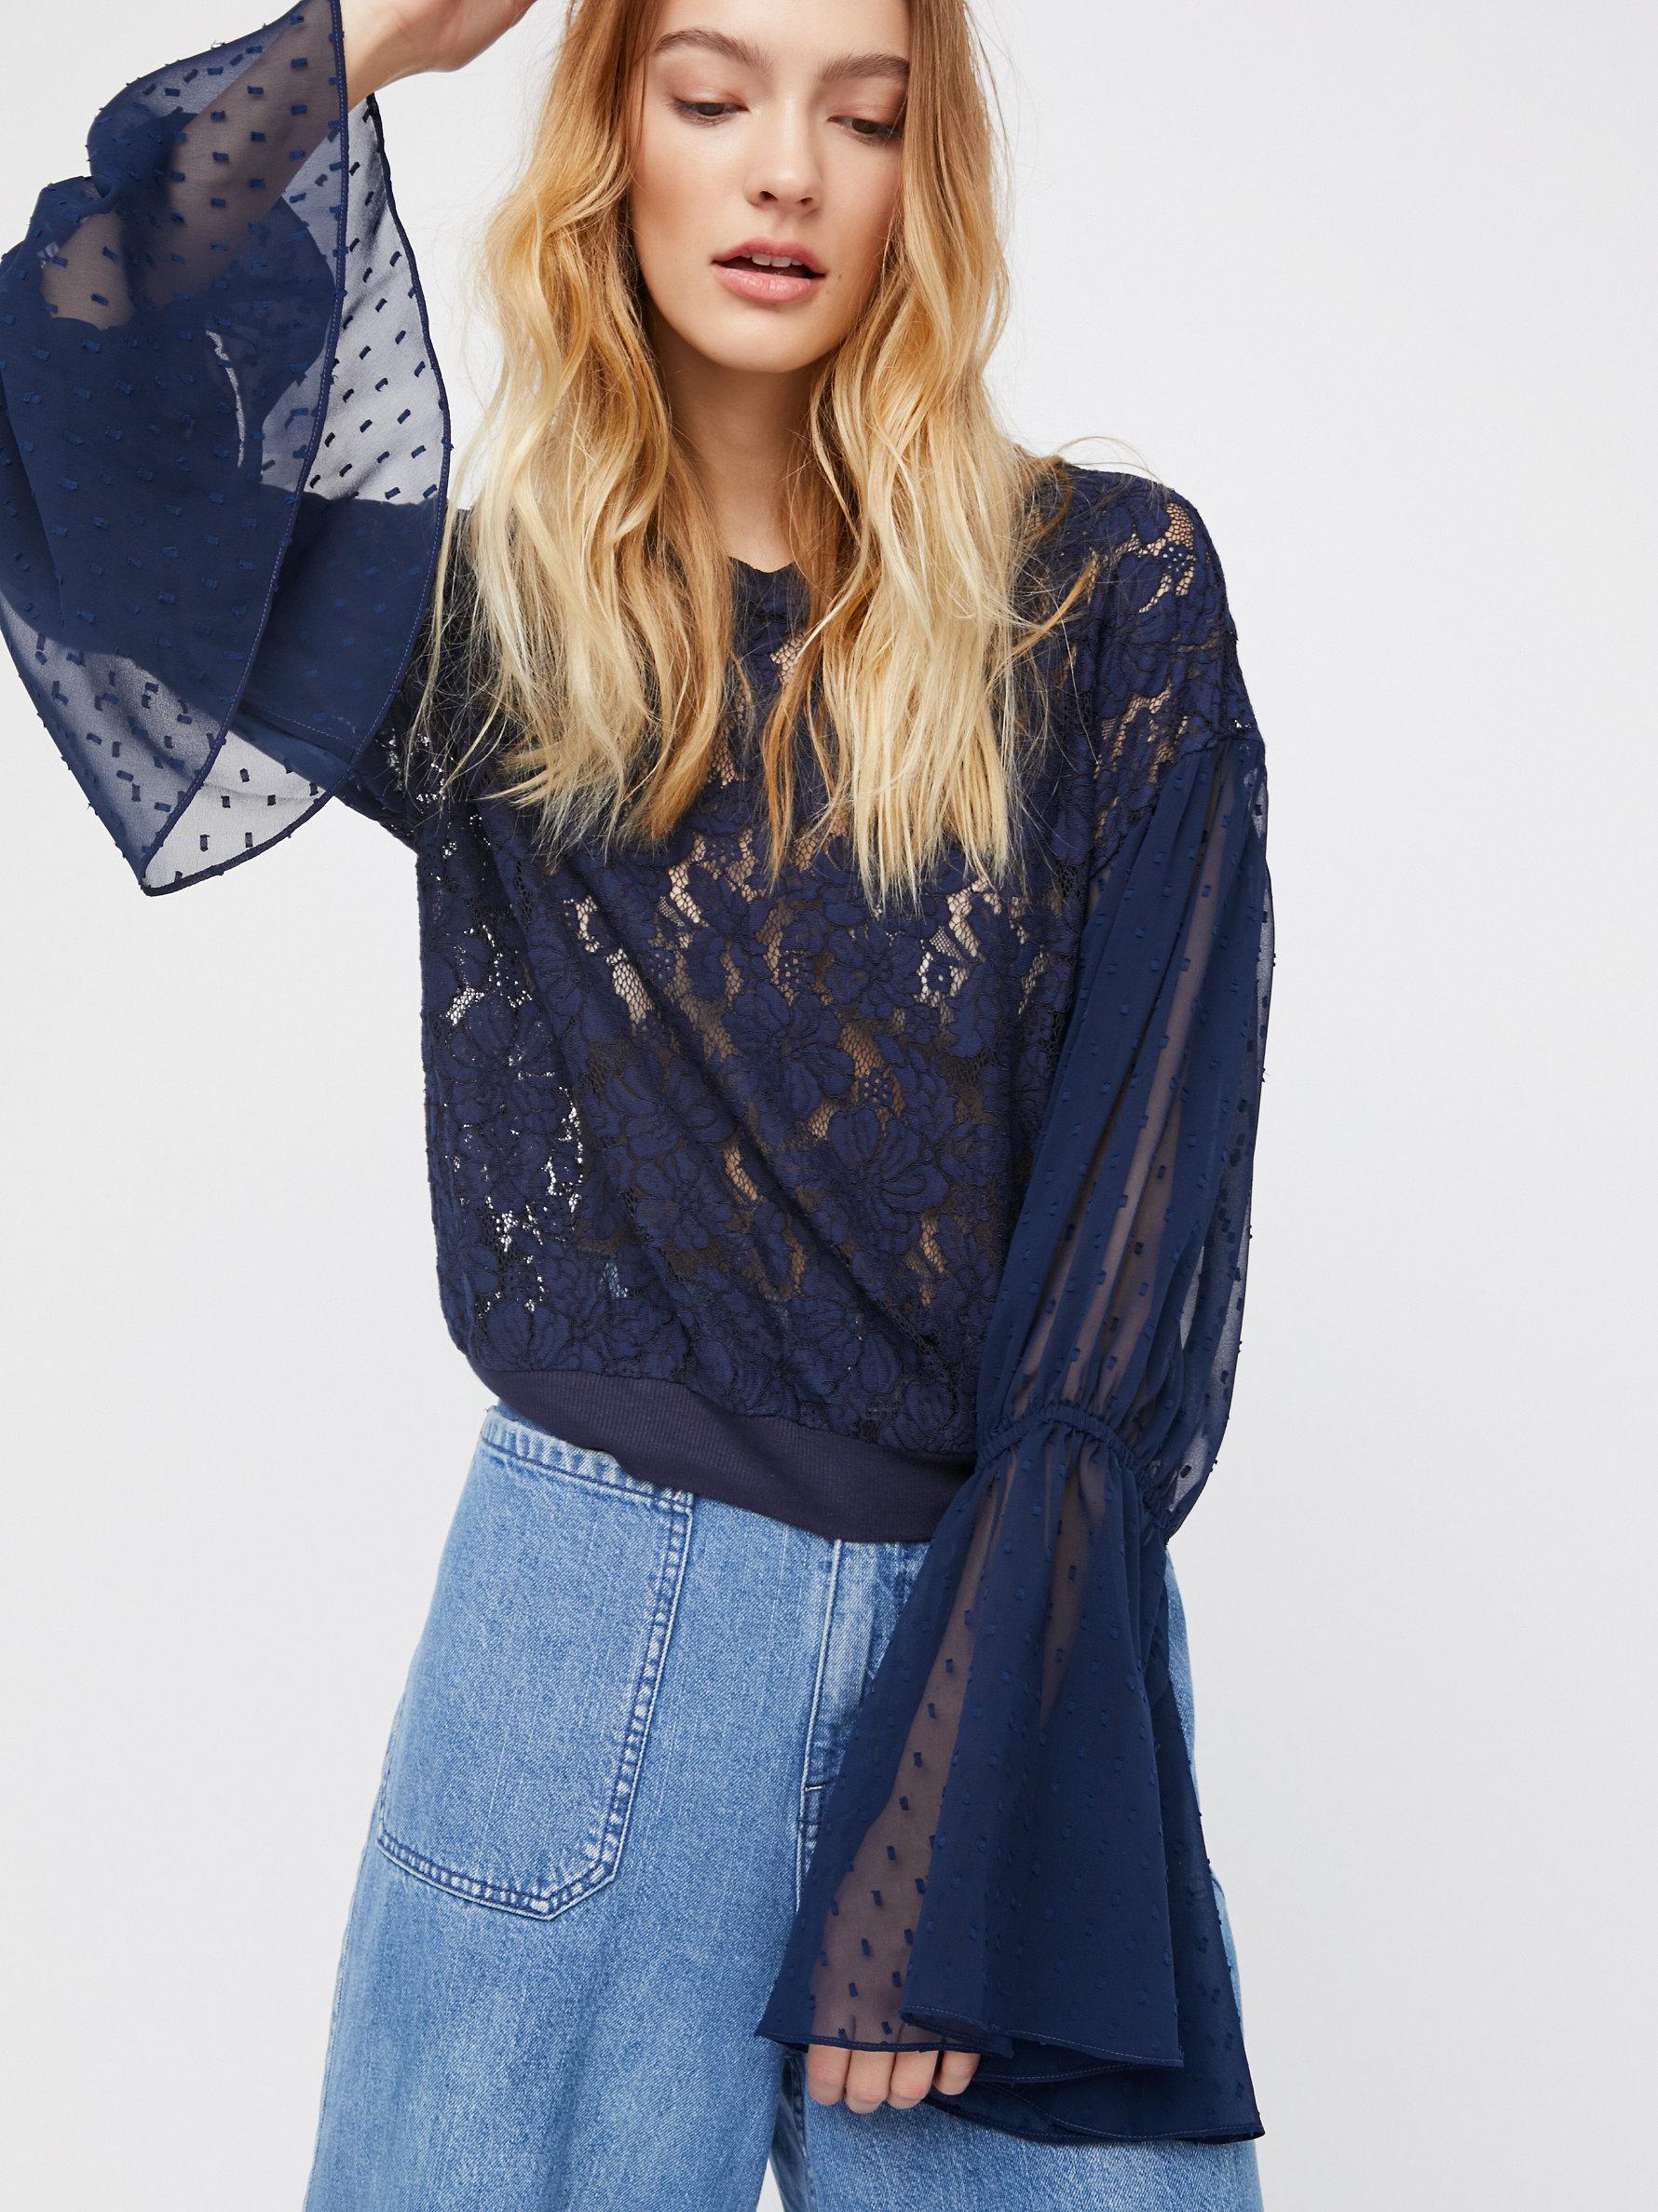 Blouses - Peasant Blouses & Sheer Silk Blouses | Free People